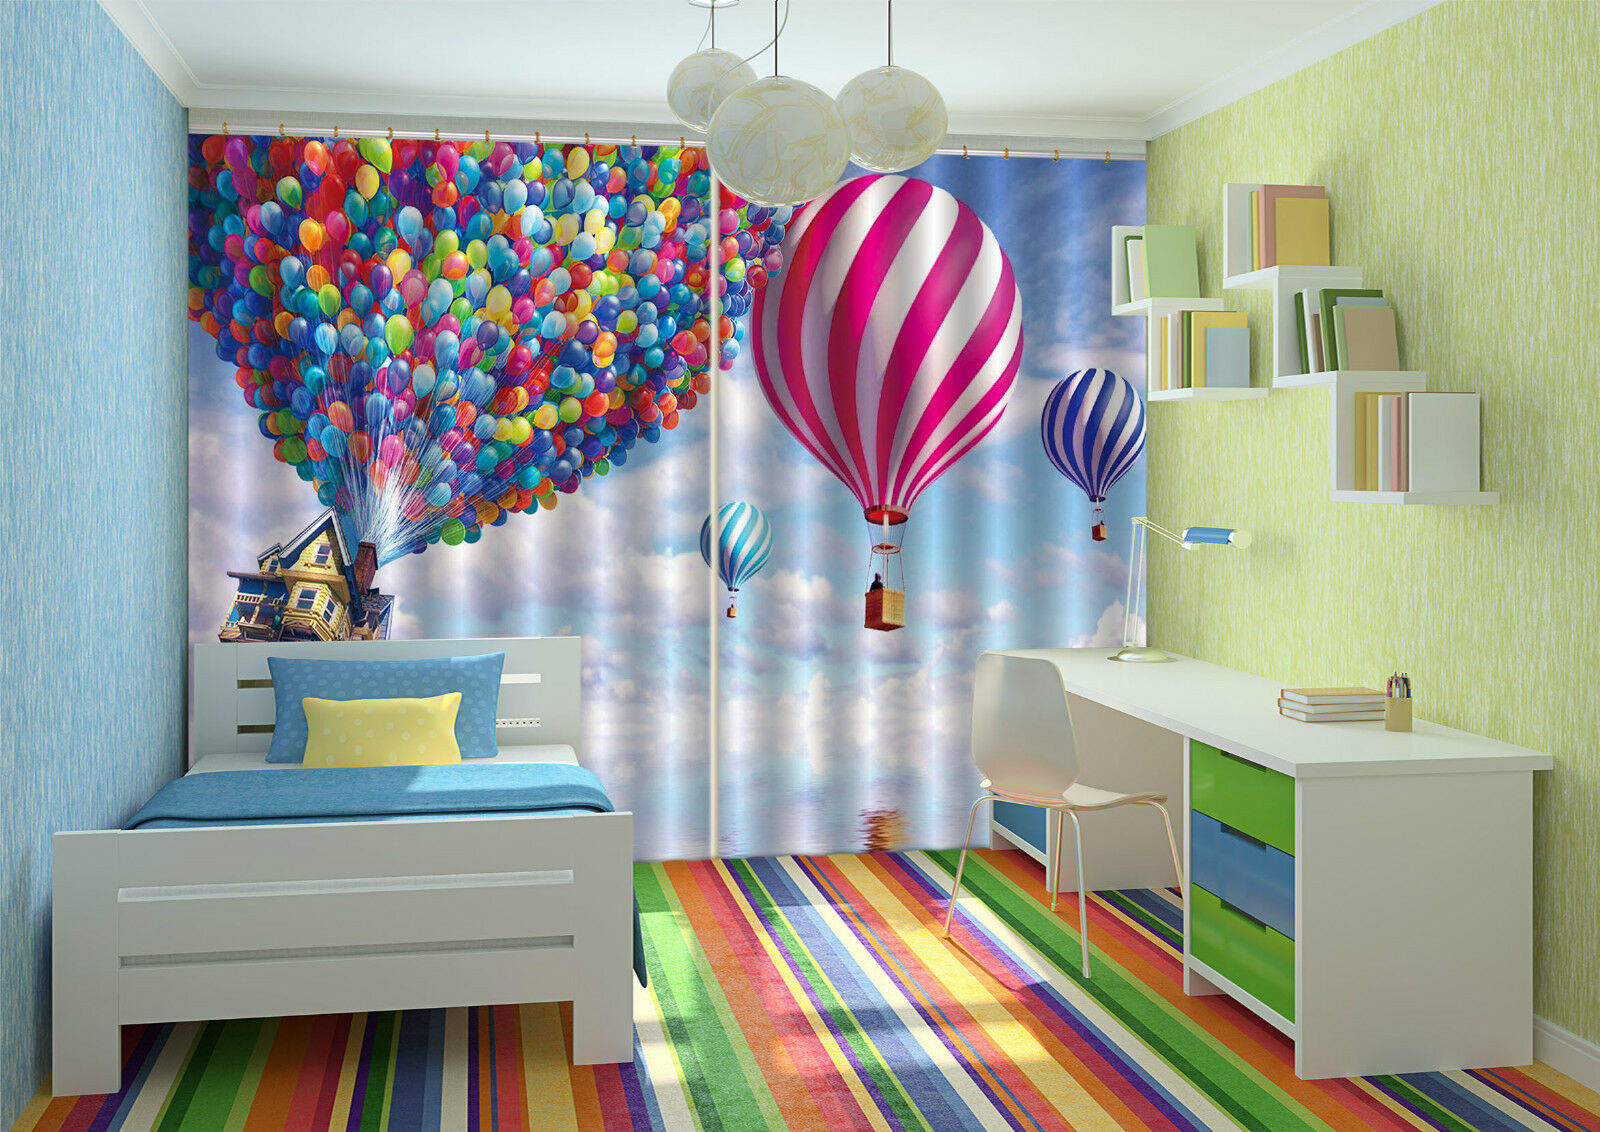 3d Color globo 438 bloqueo foto cortina cortina de impresión sustancia cortinas de ventana